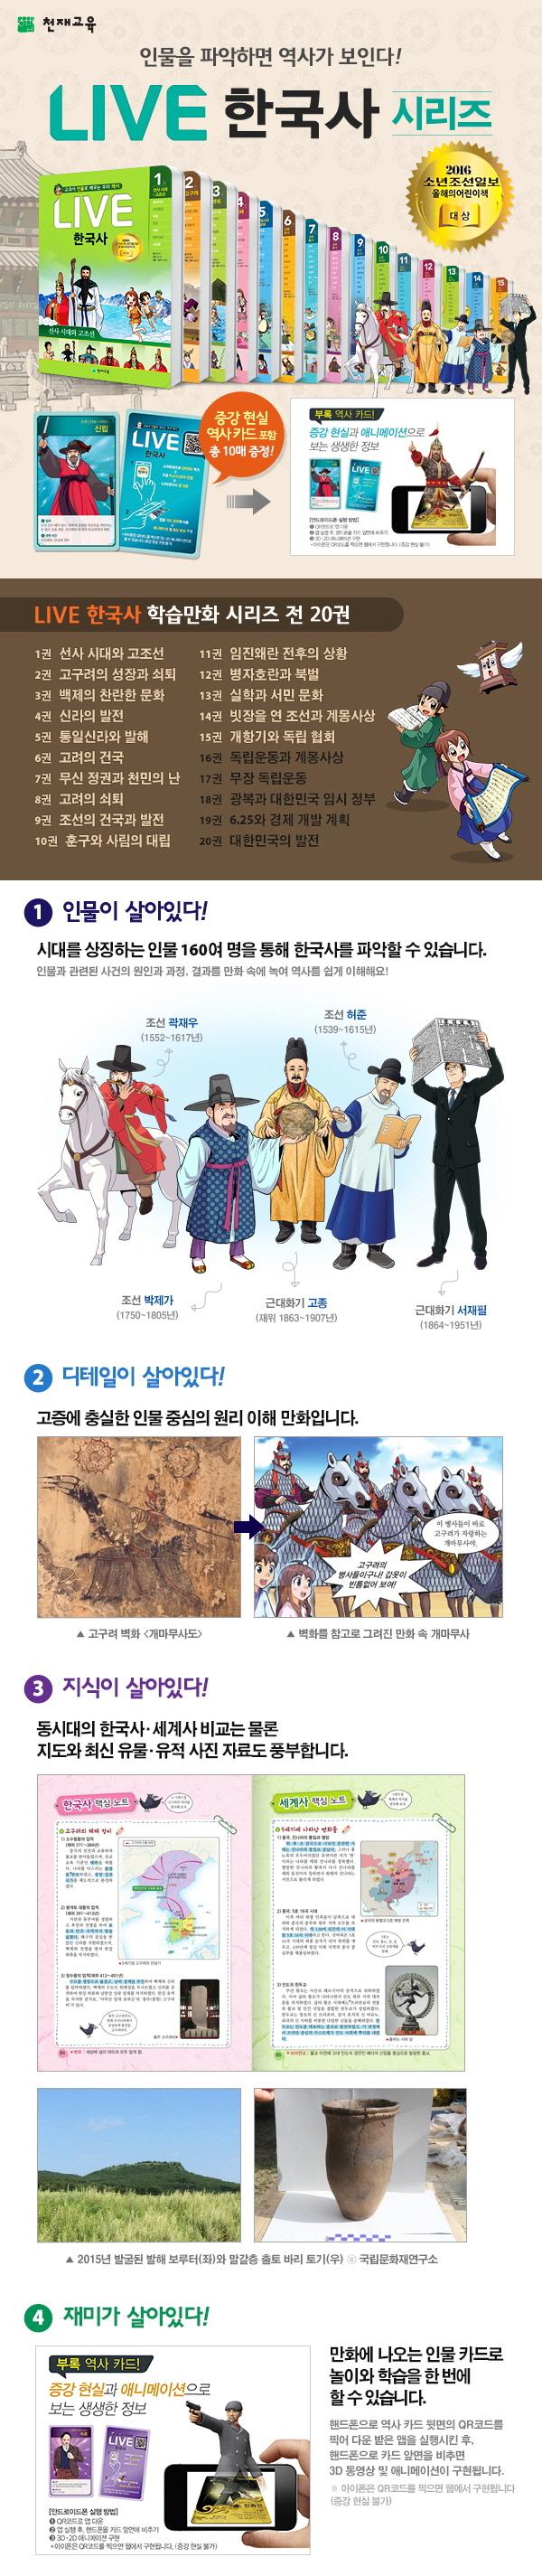 Live 한국사. 13: 실학과 서민 문화(양장본 HardCover) 도서 상세이미지